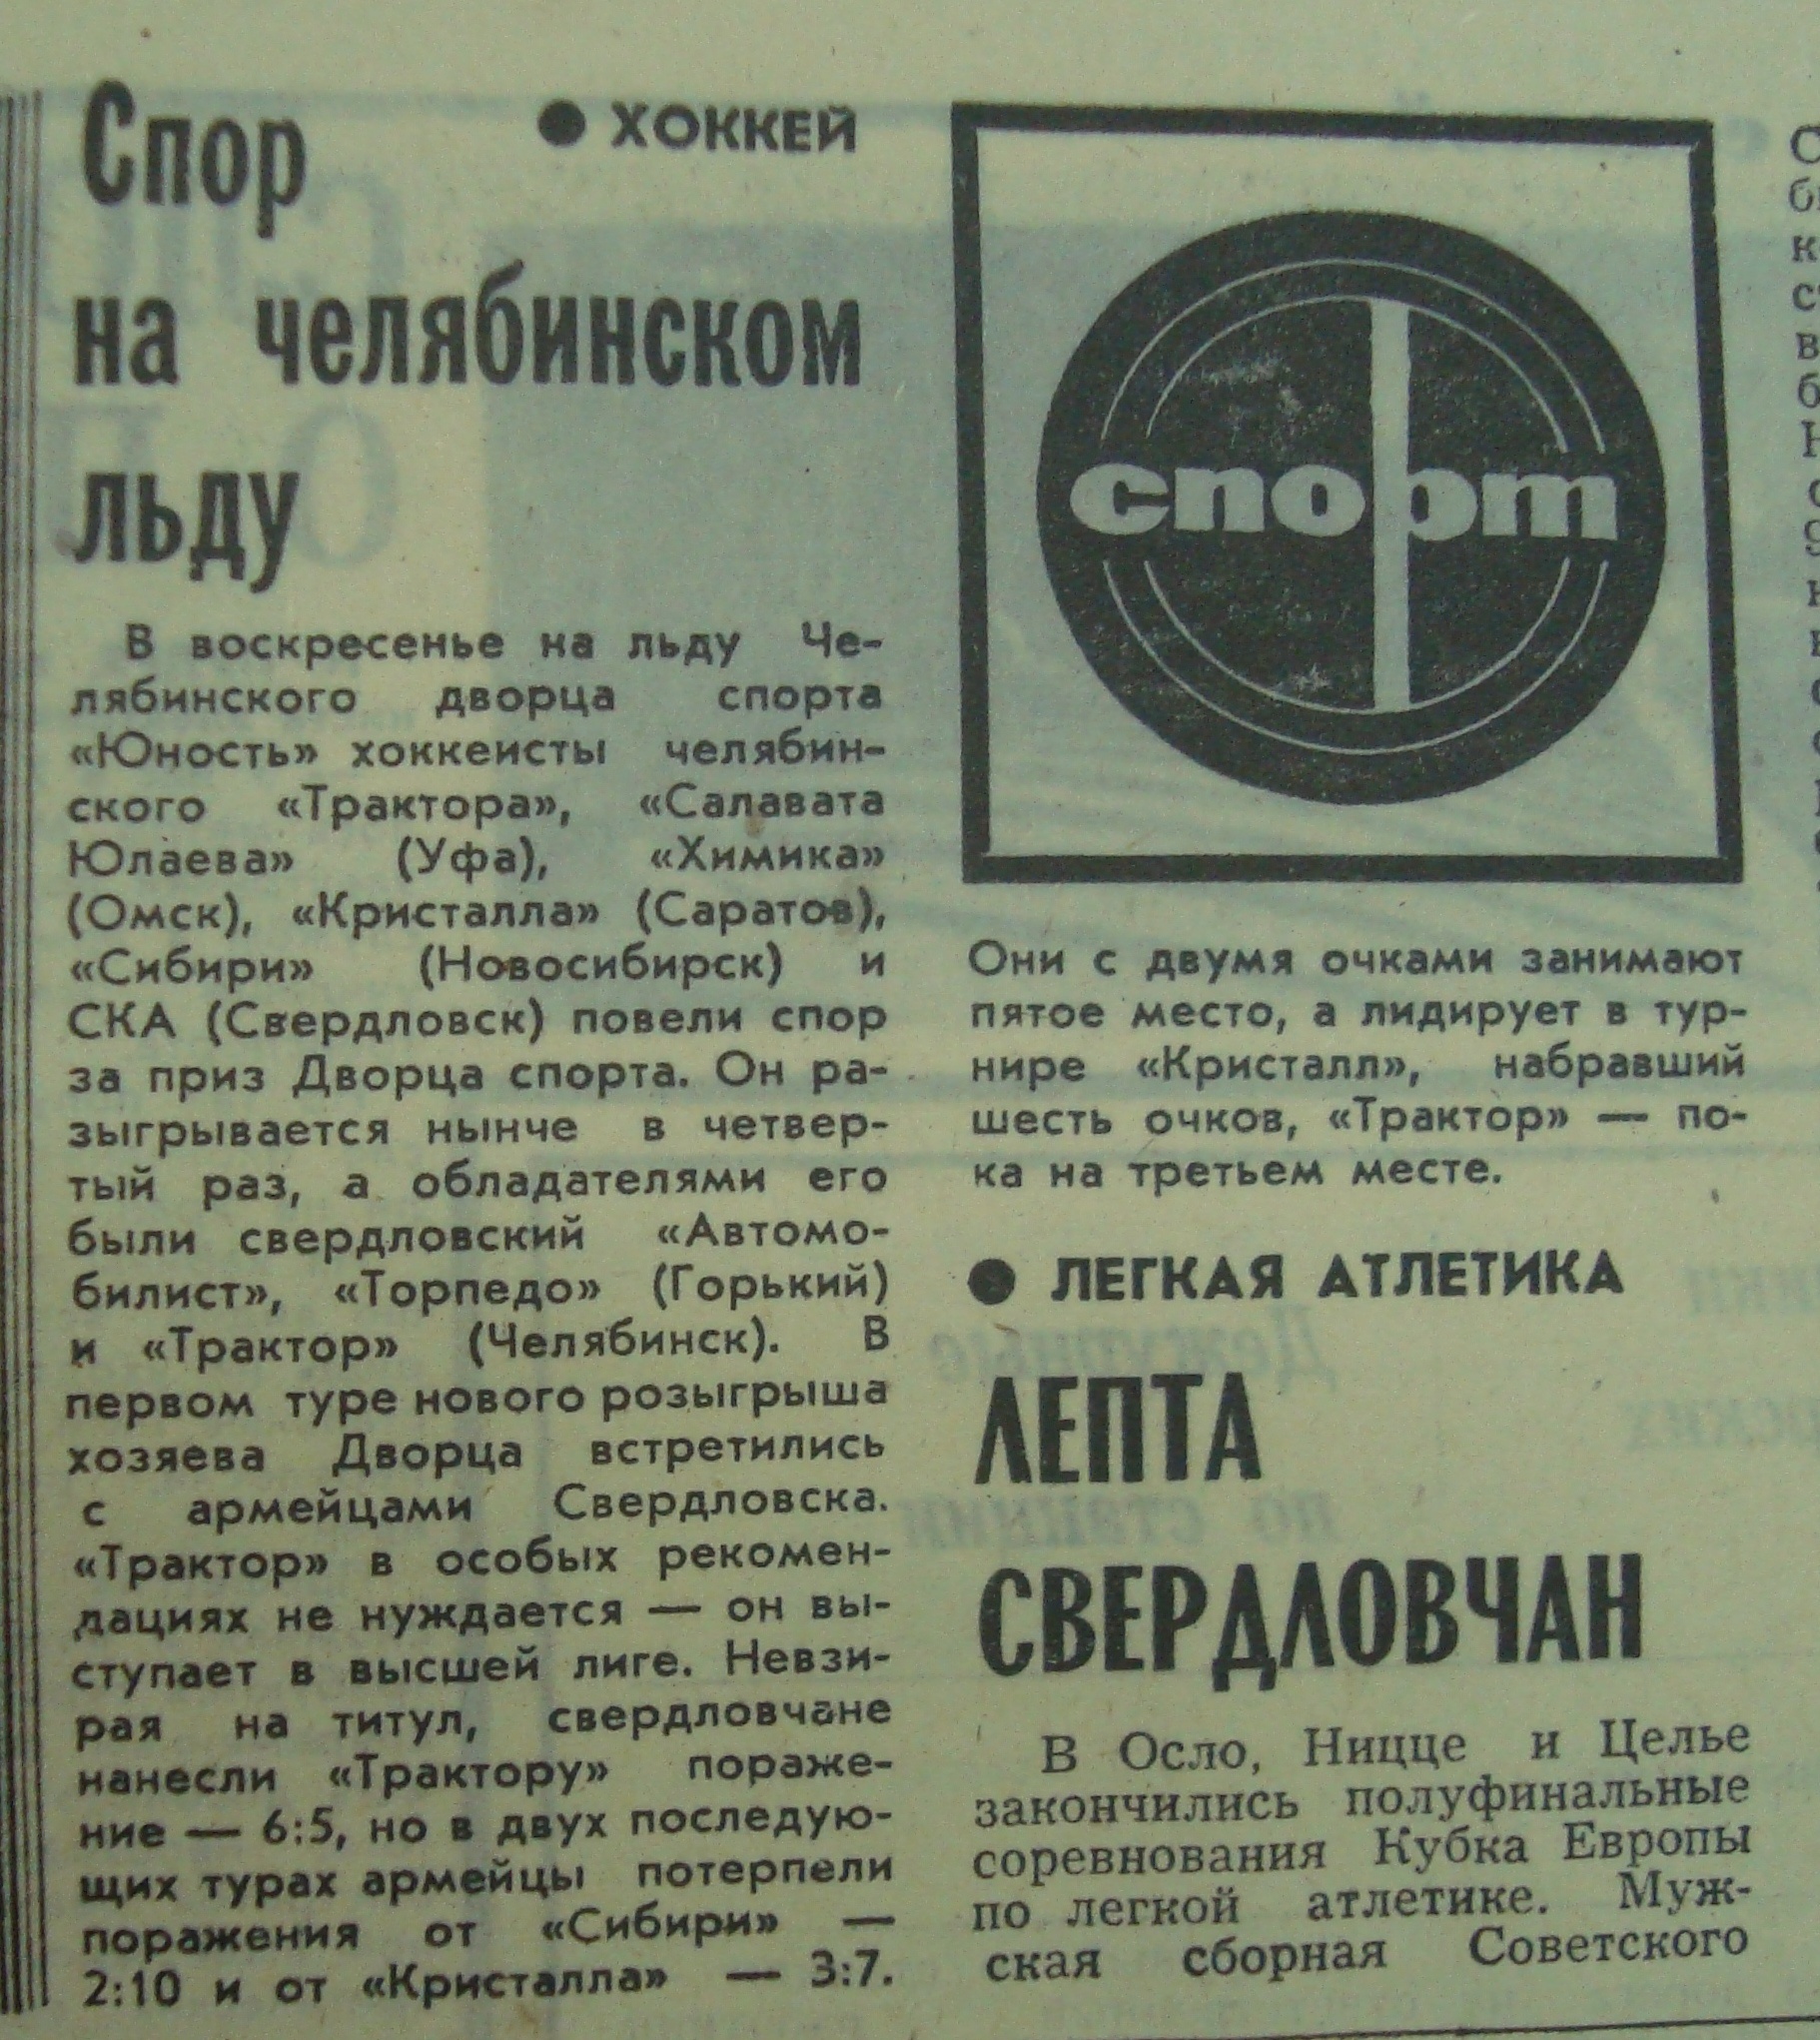 челябинск - турнир 1973.JPG